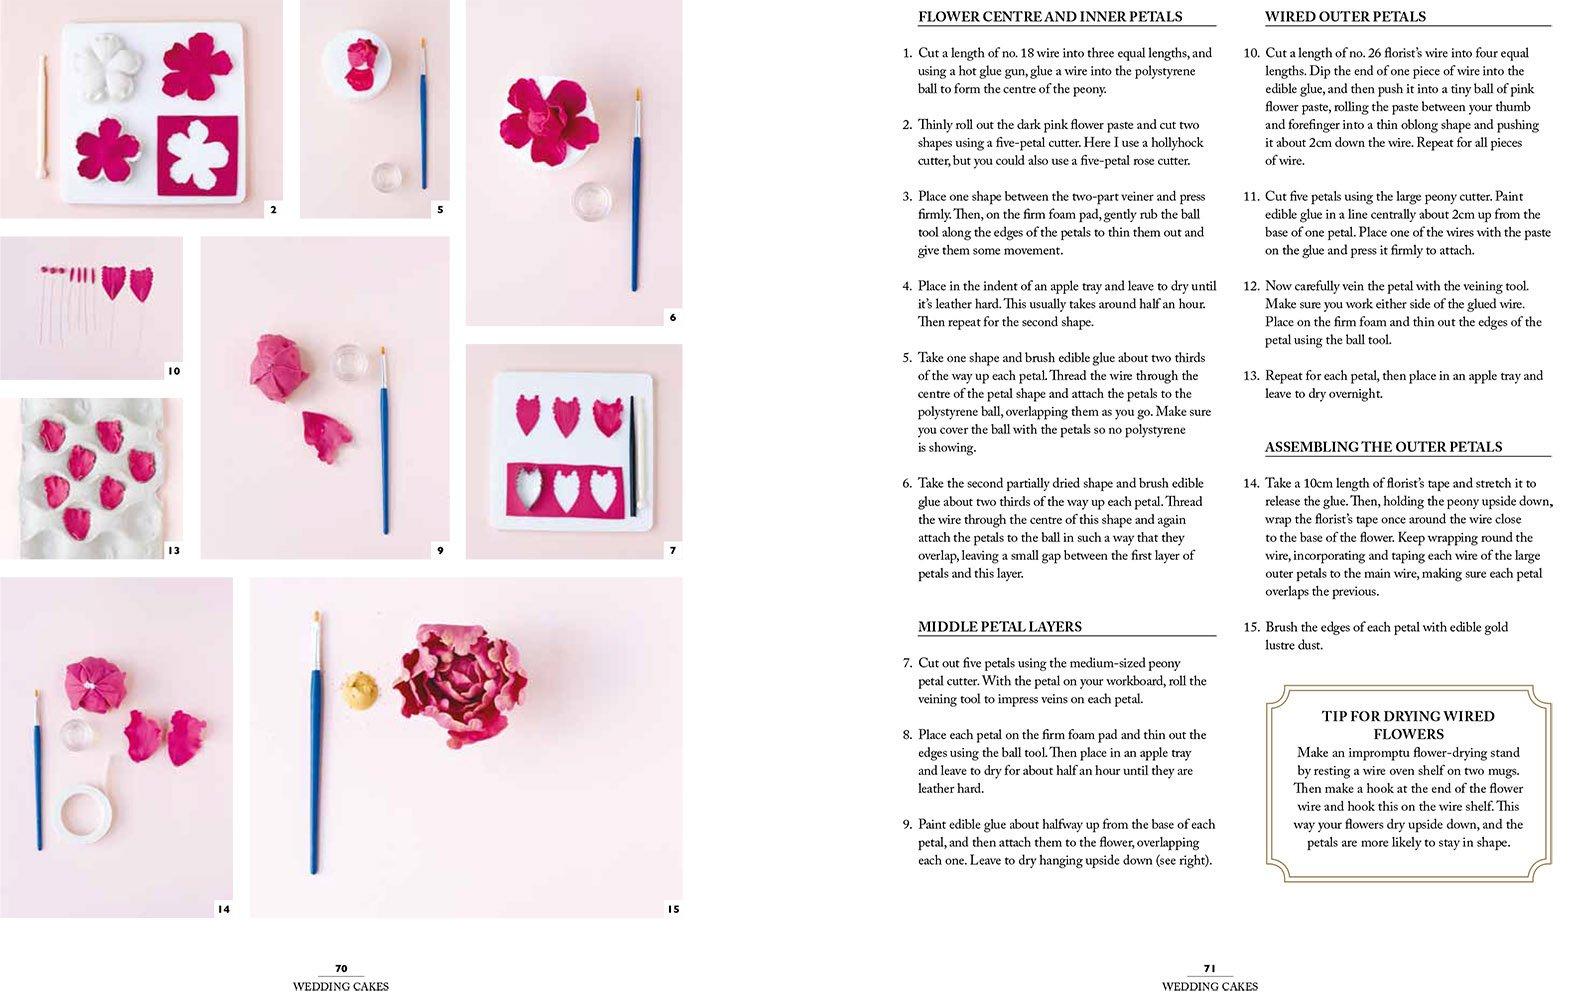 Wedding Cakes Amazon Rosalind Miller 9781908714084 Books